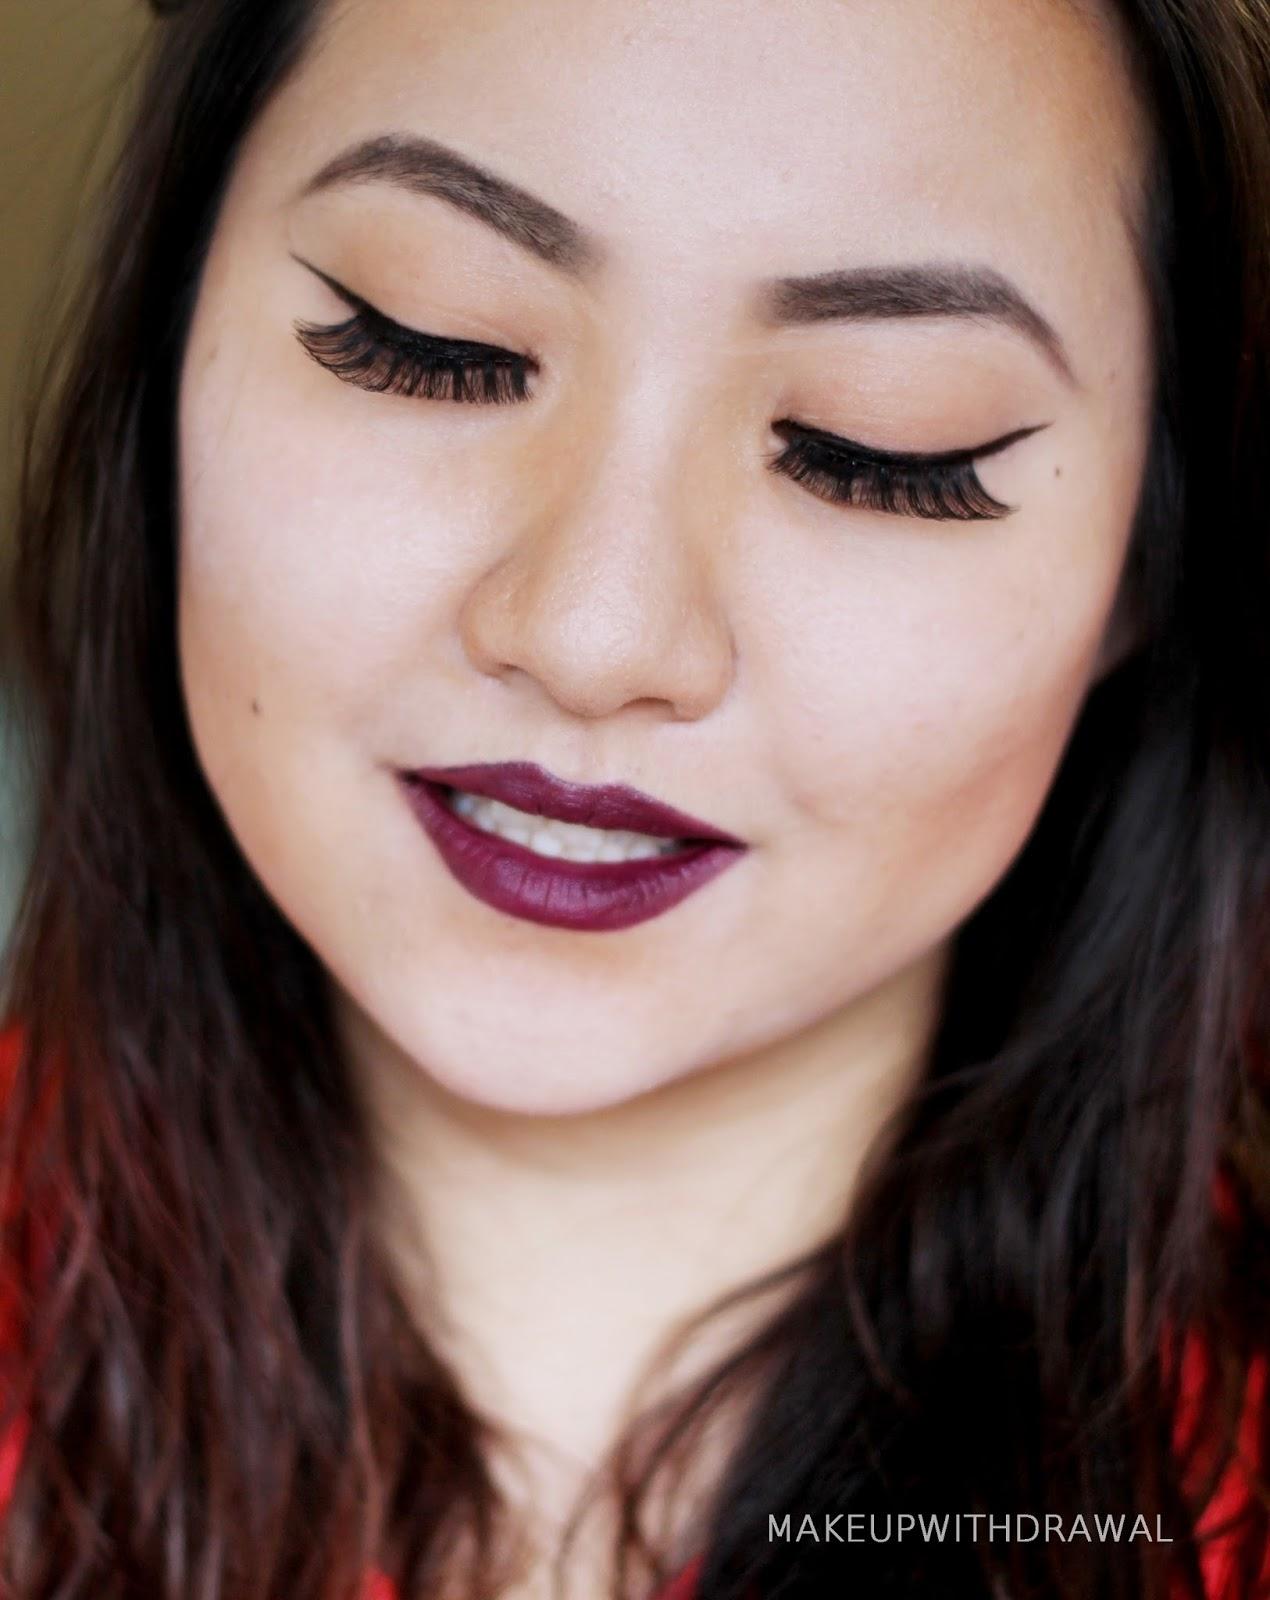 FOTD feat. Impulse Cosmetics Pandora   Makeup Withdrawal